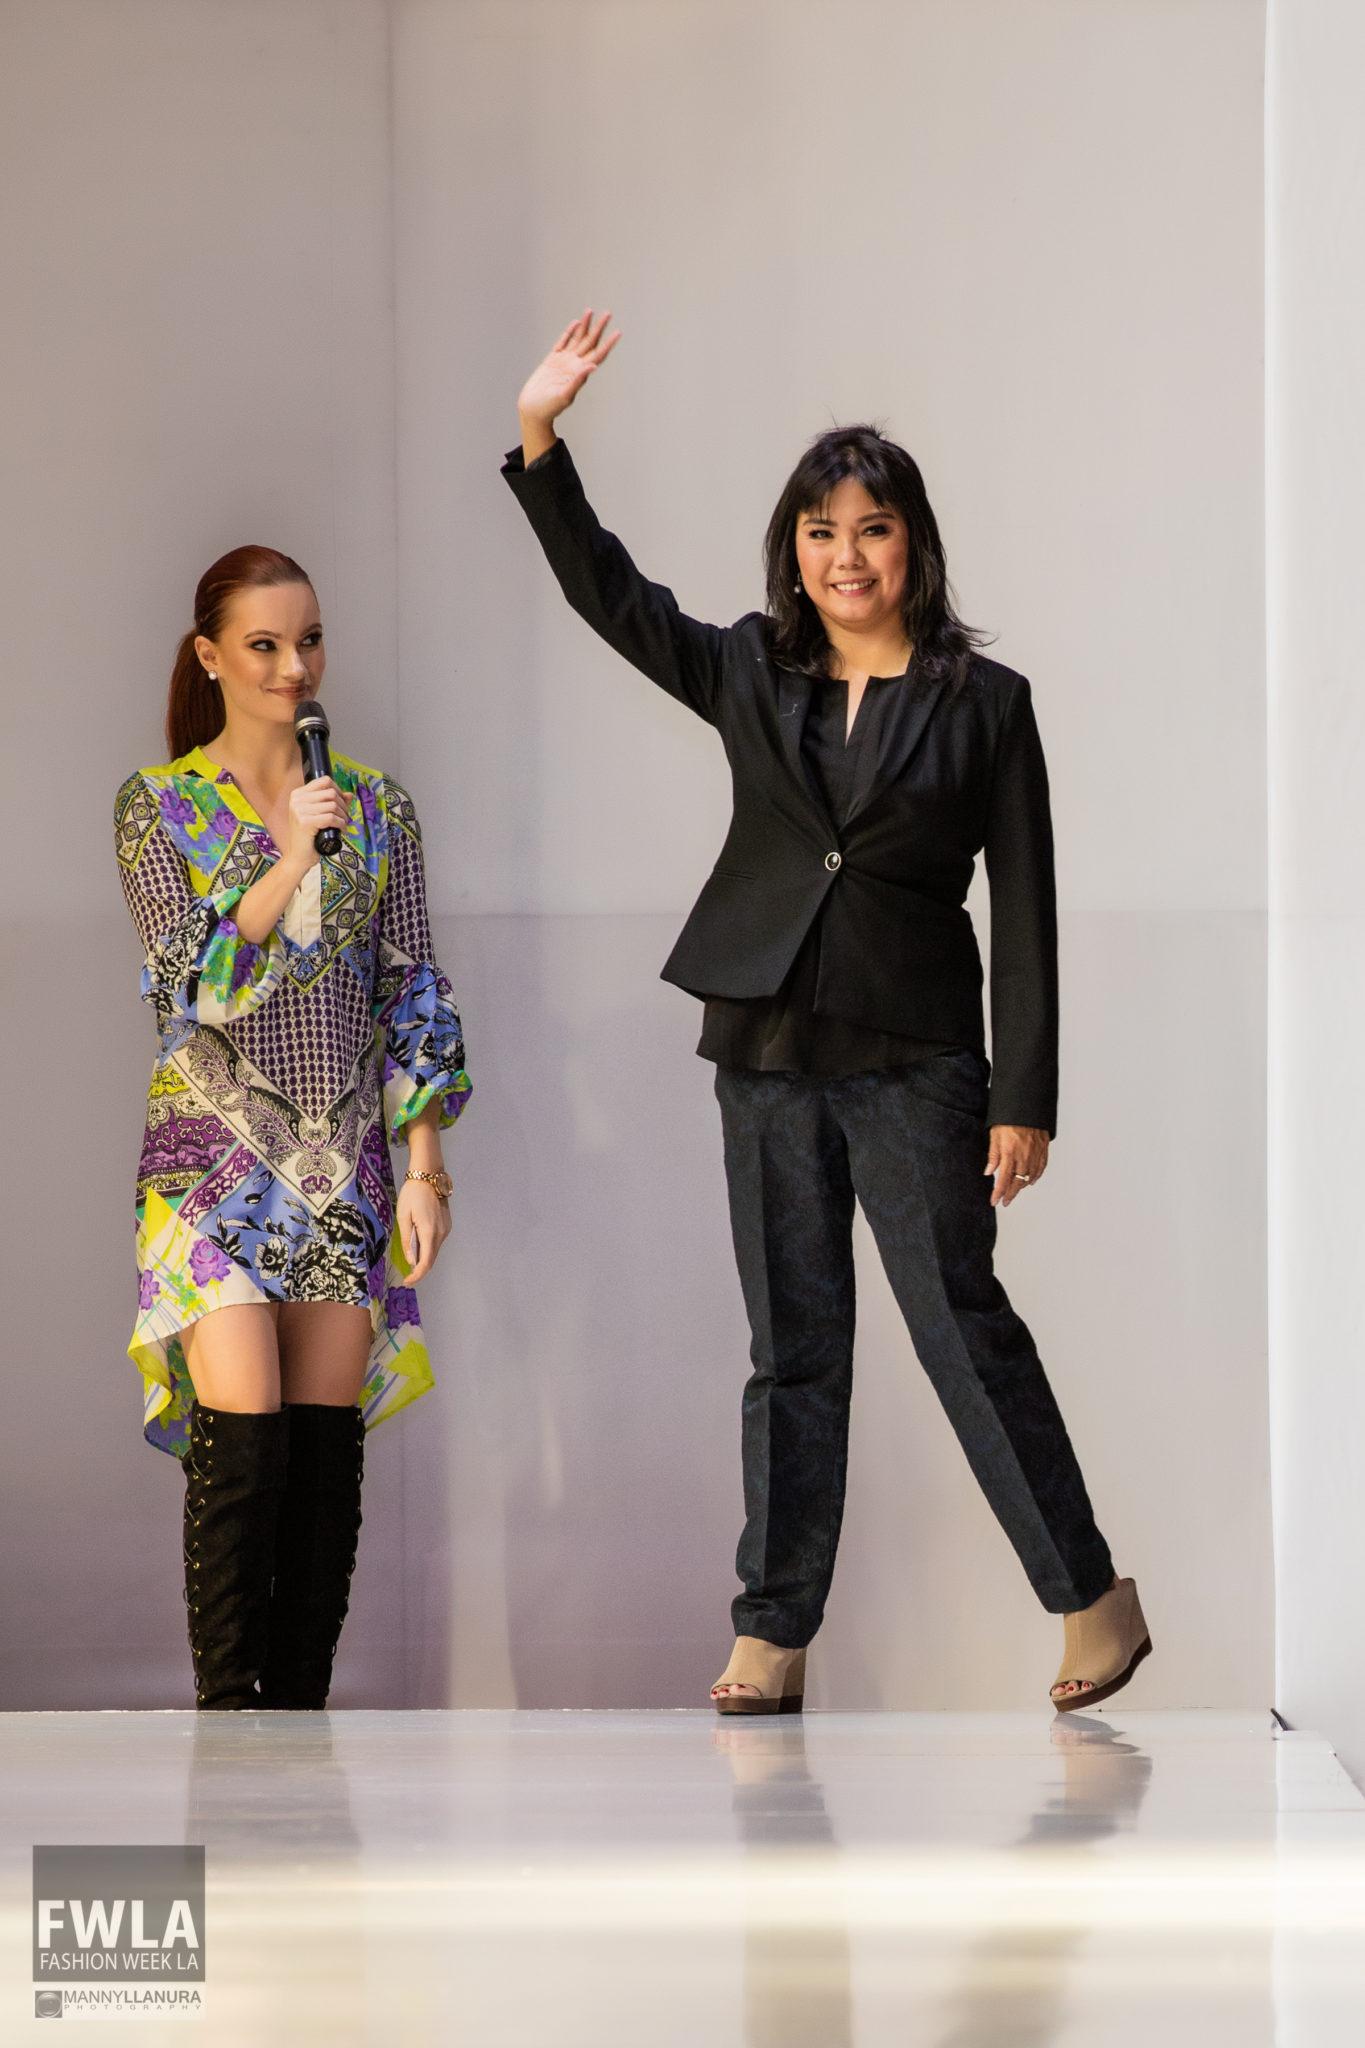 Lou Razon Designer LouLou Couture